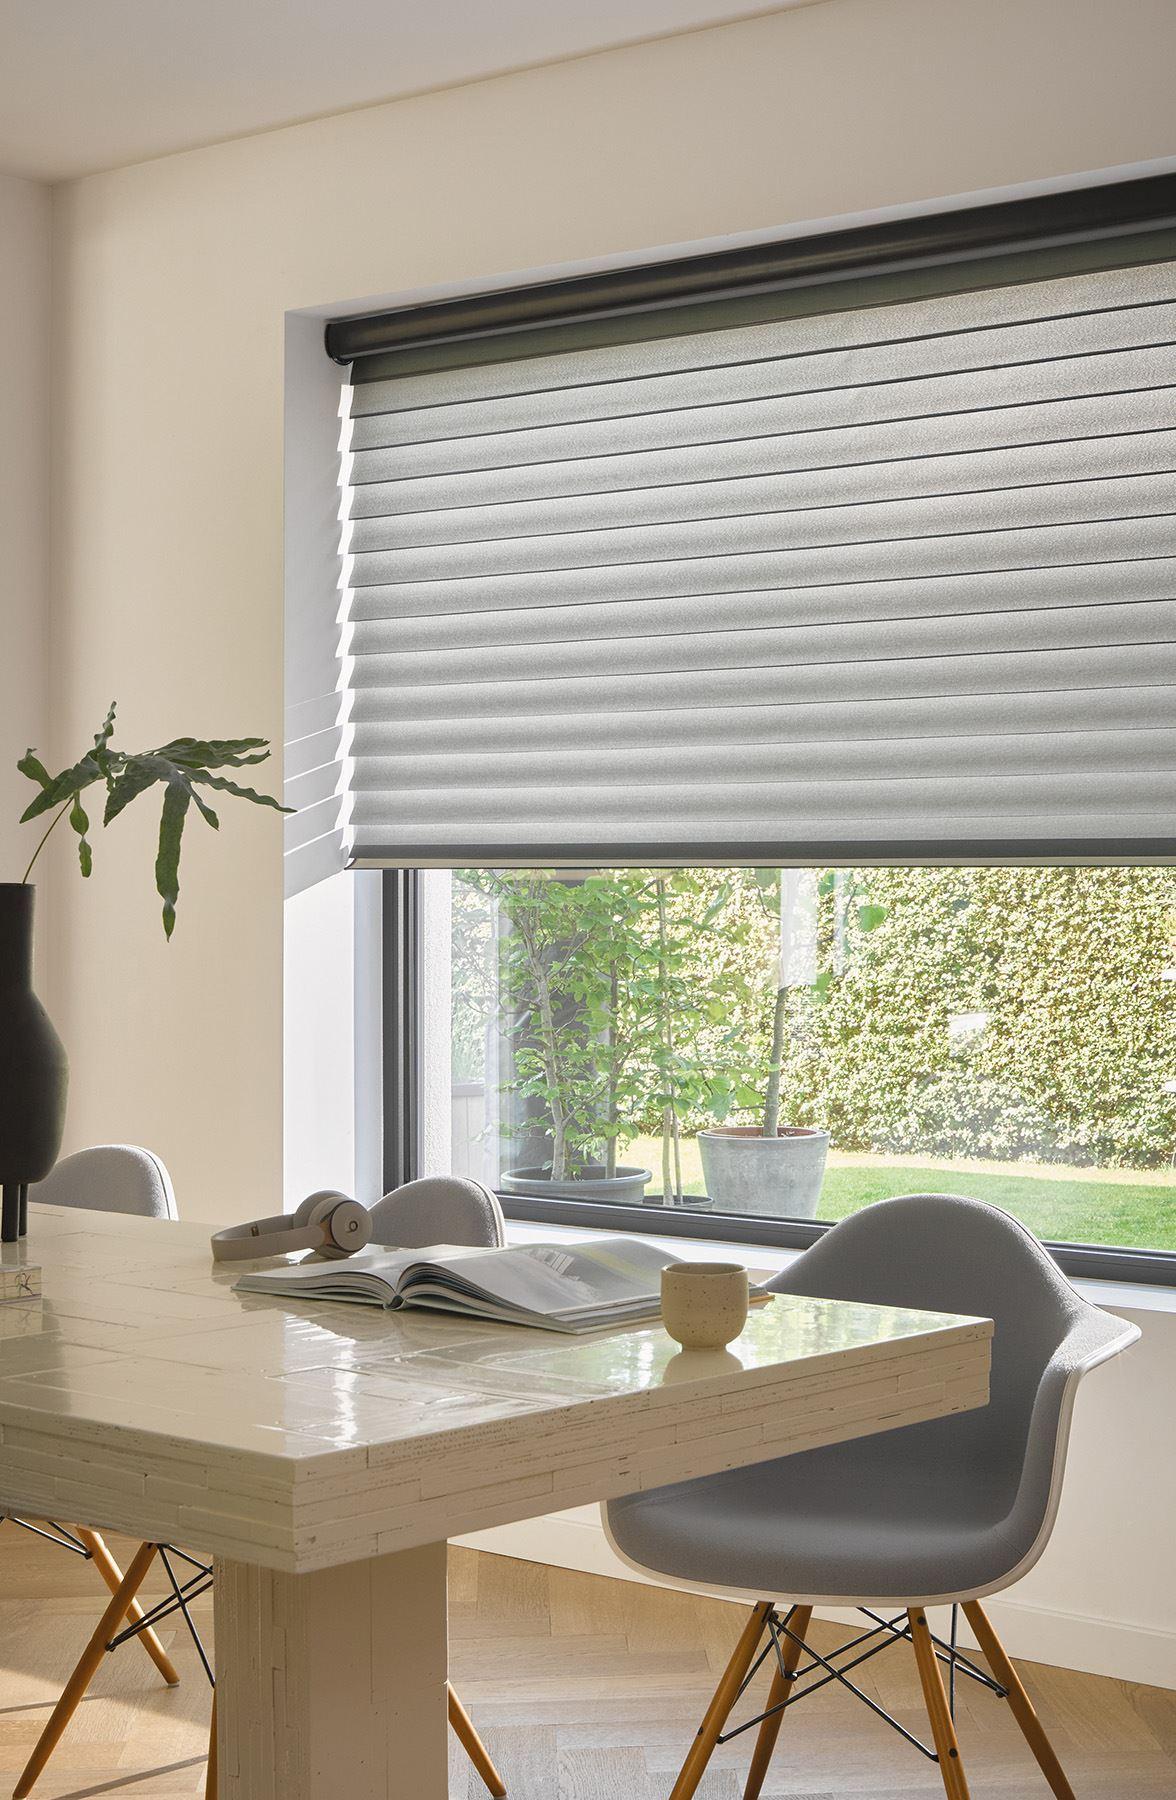 Afbeelding van Luxaflex® Silhouette® Shades 75 mm met powerview